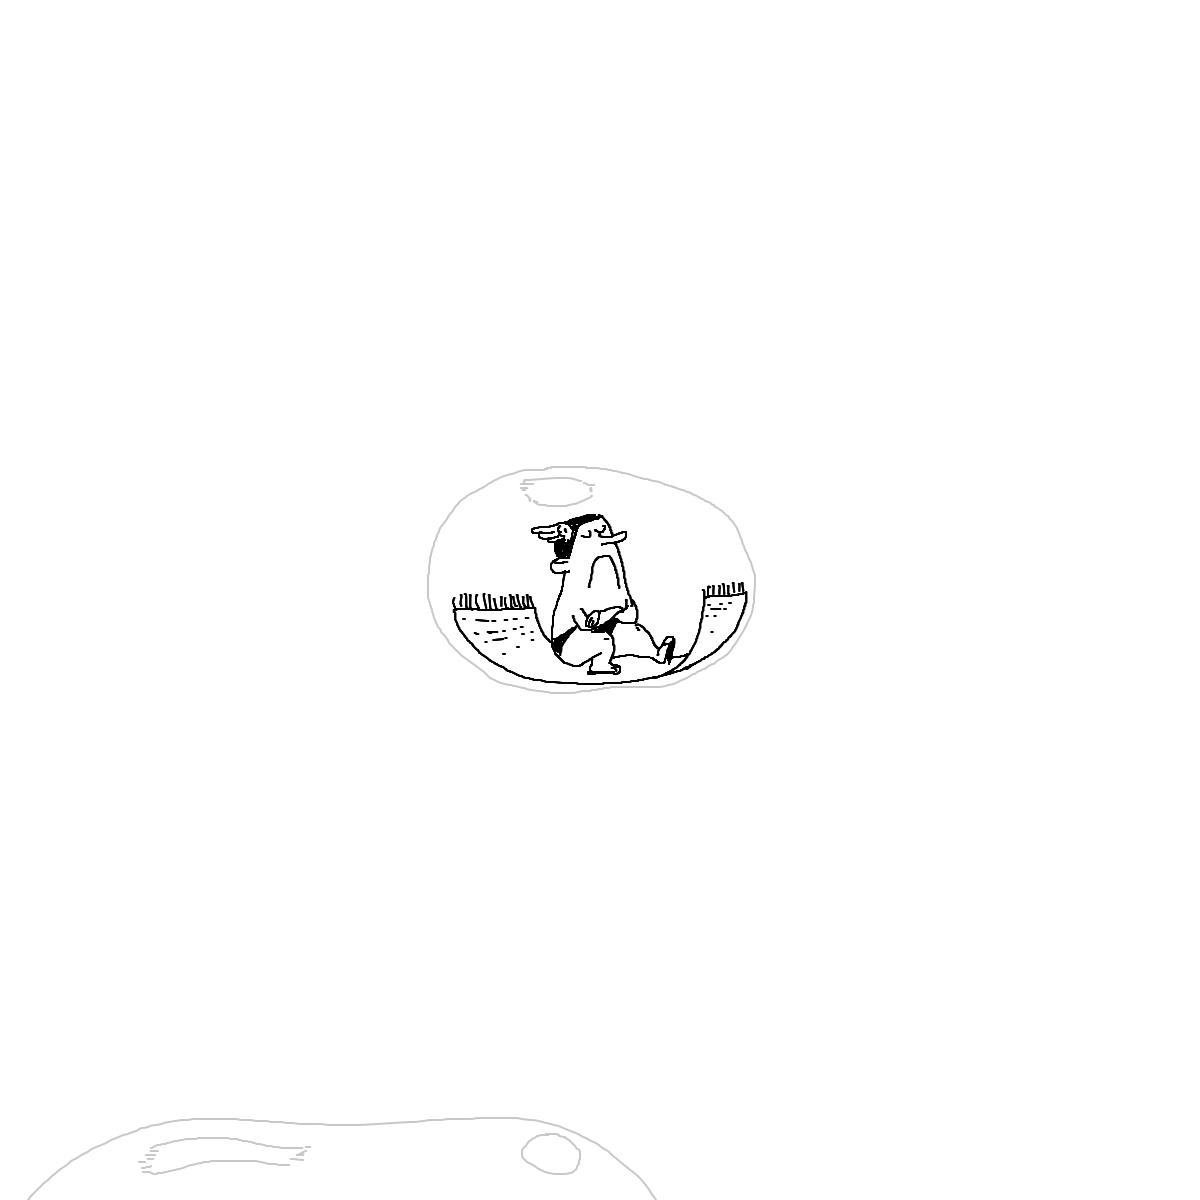 BAAAM drawing#3770 lat:78.4207839965820300lng: -4.4887499809265140